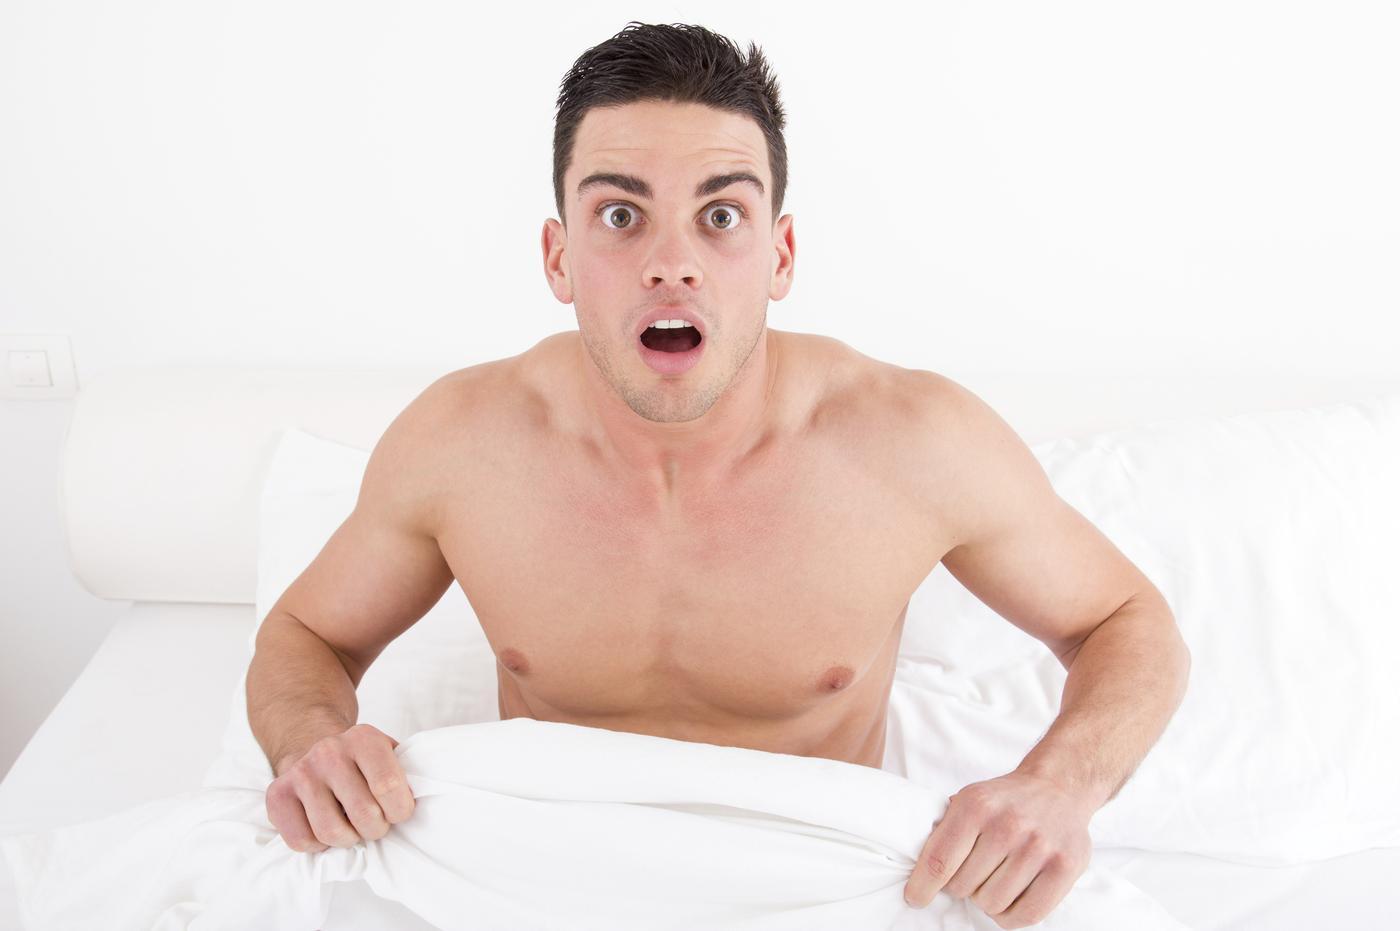 man at sex